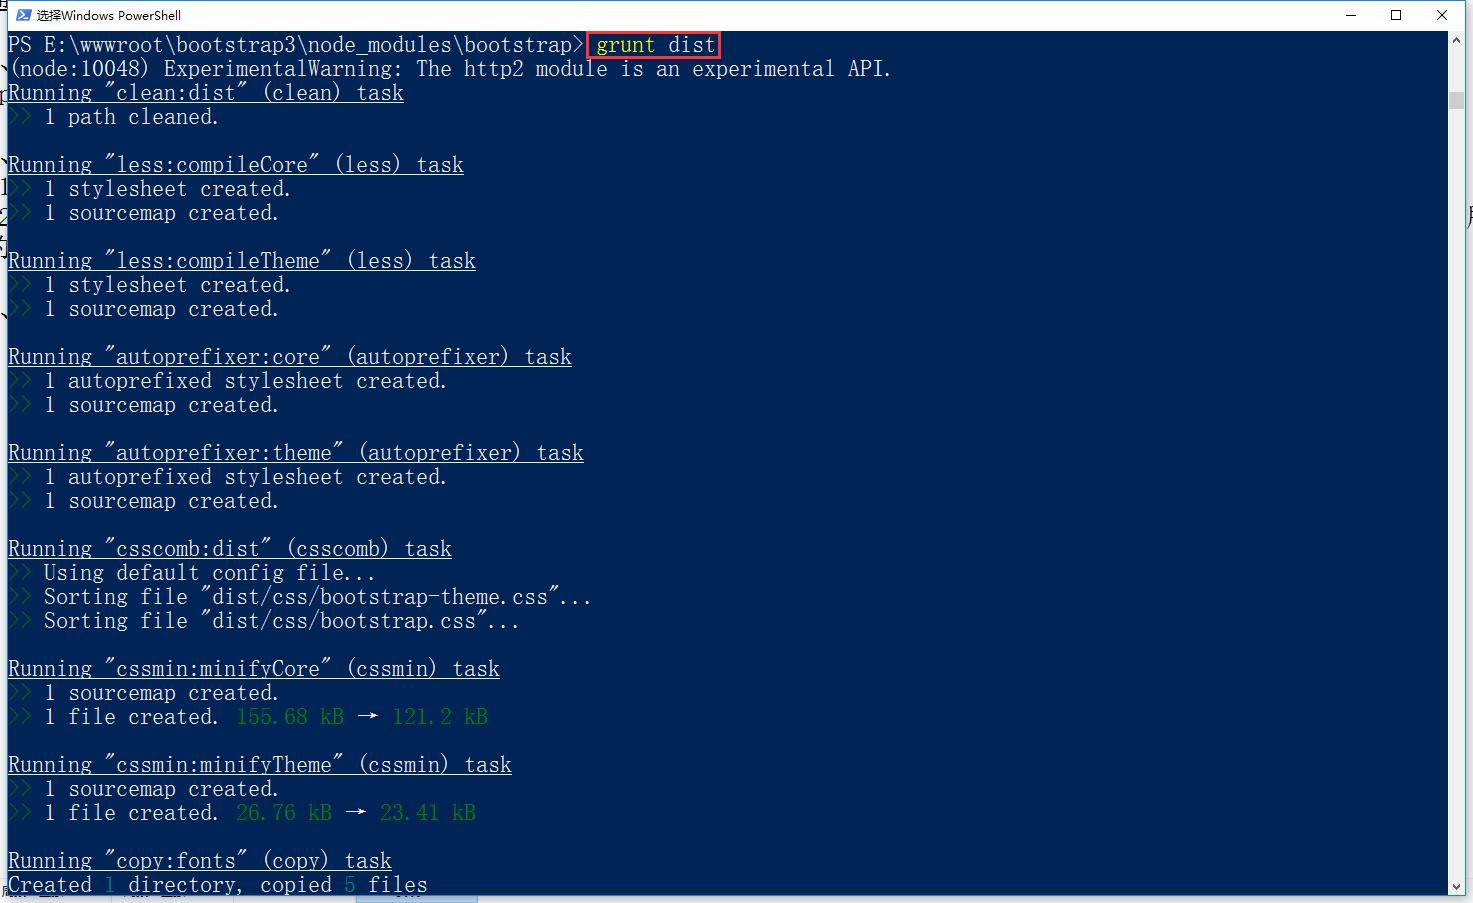 执行 grunt dist 命令,仅编译 CSS 和 JavaScript 文件